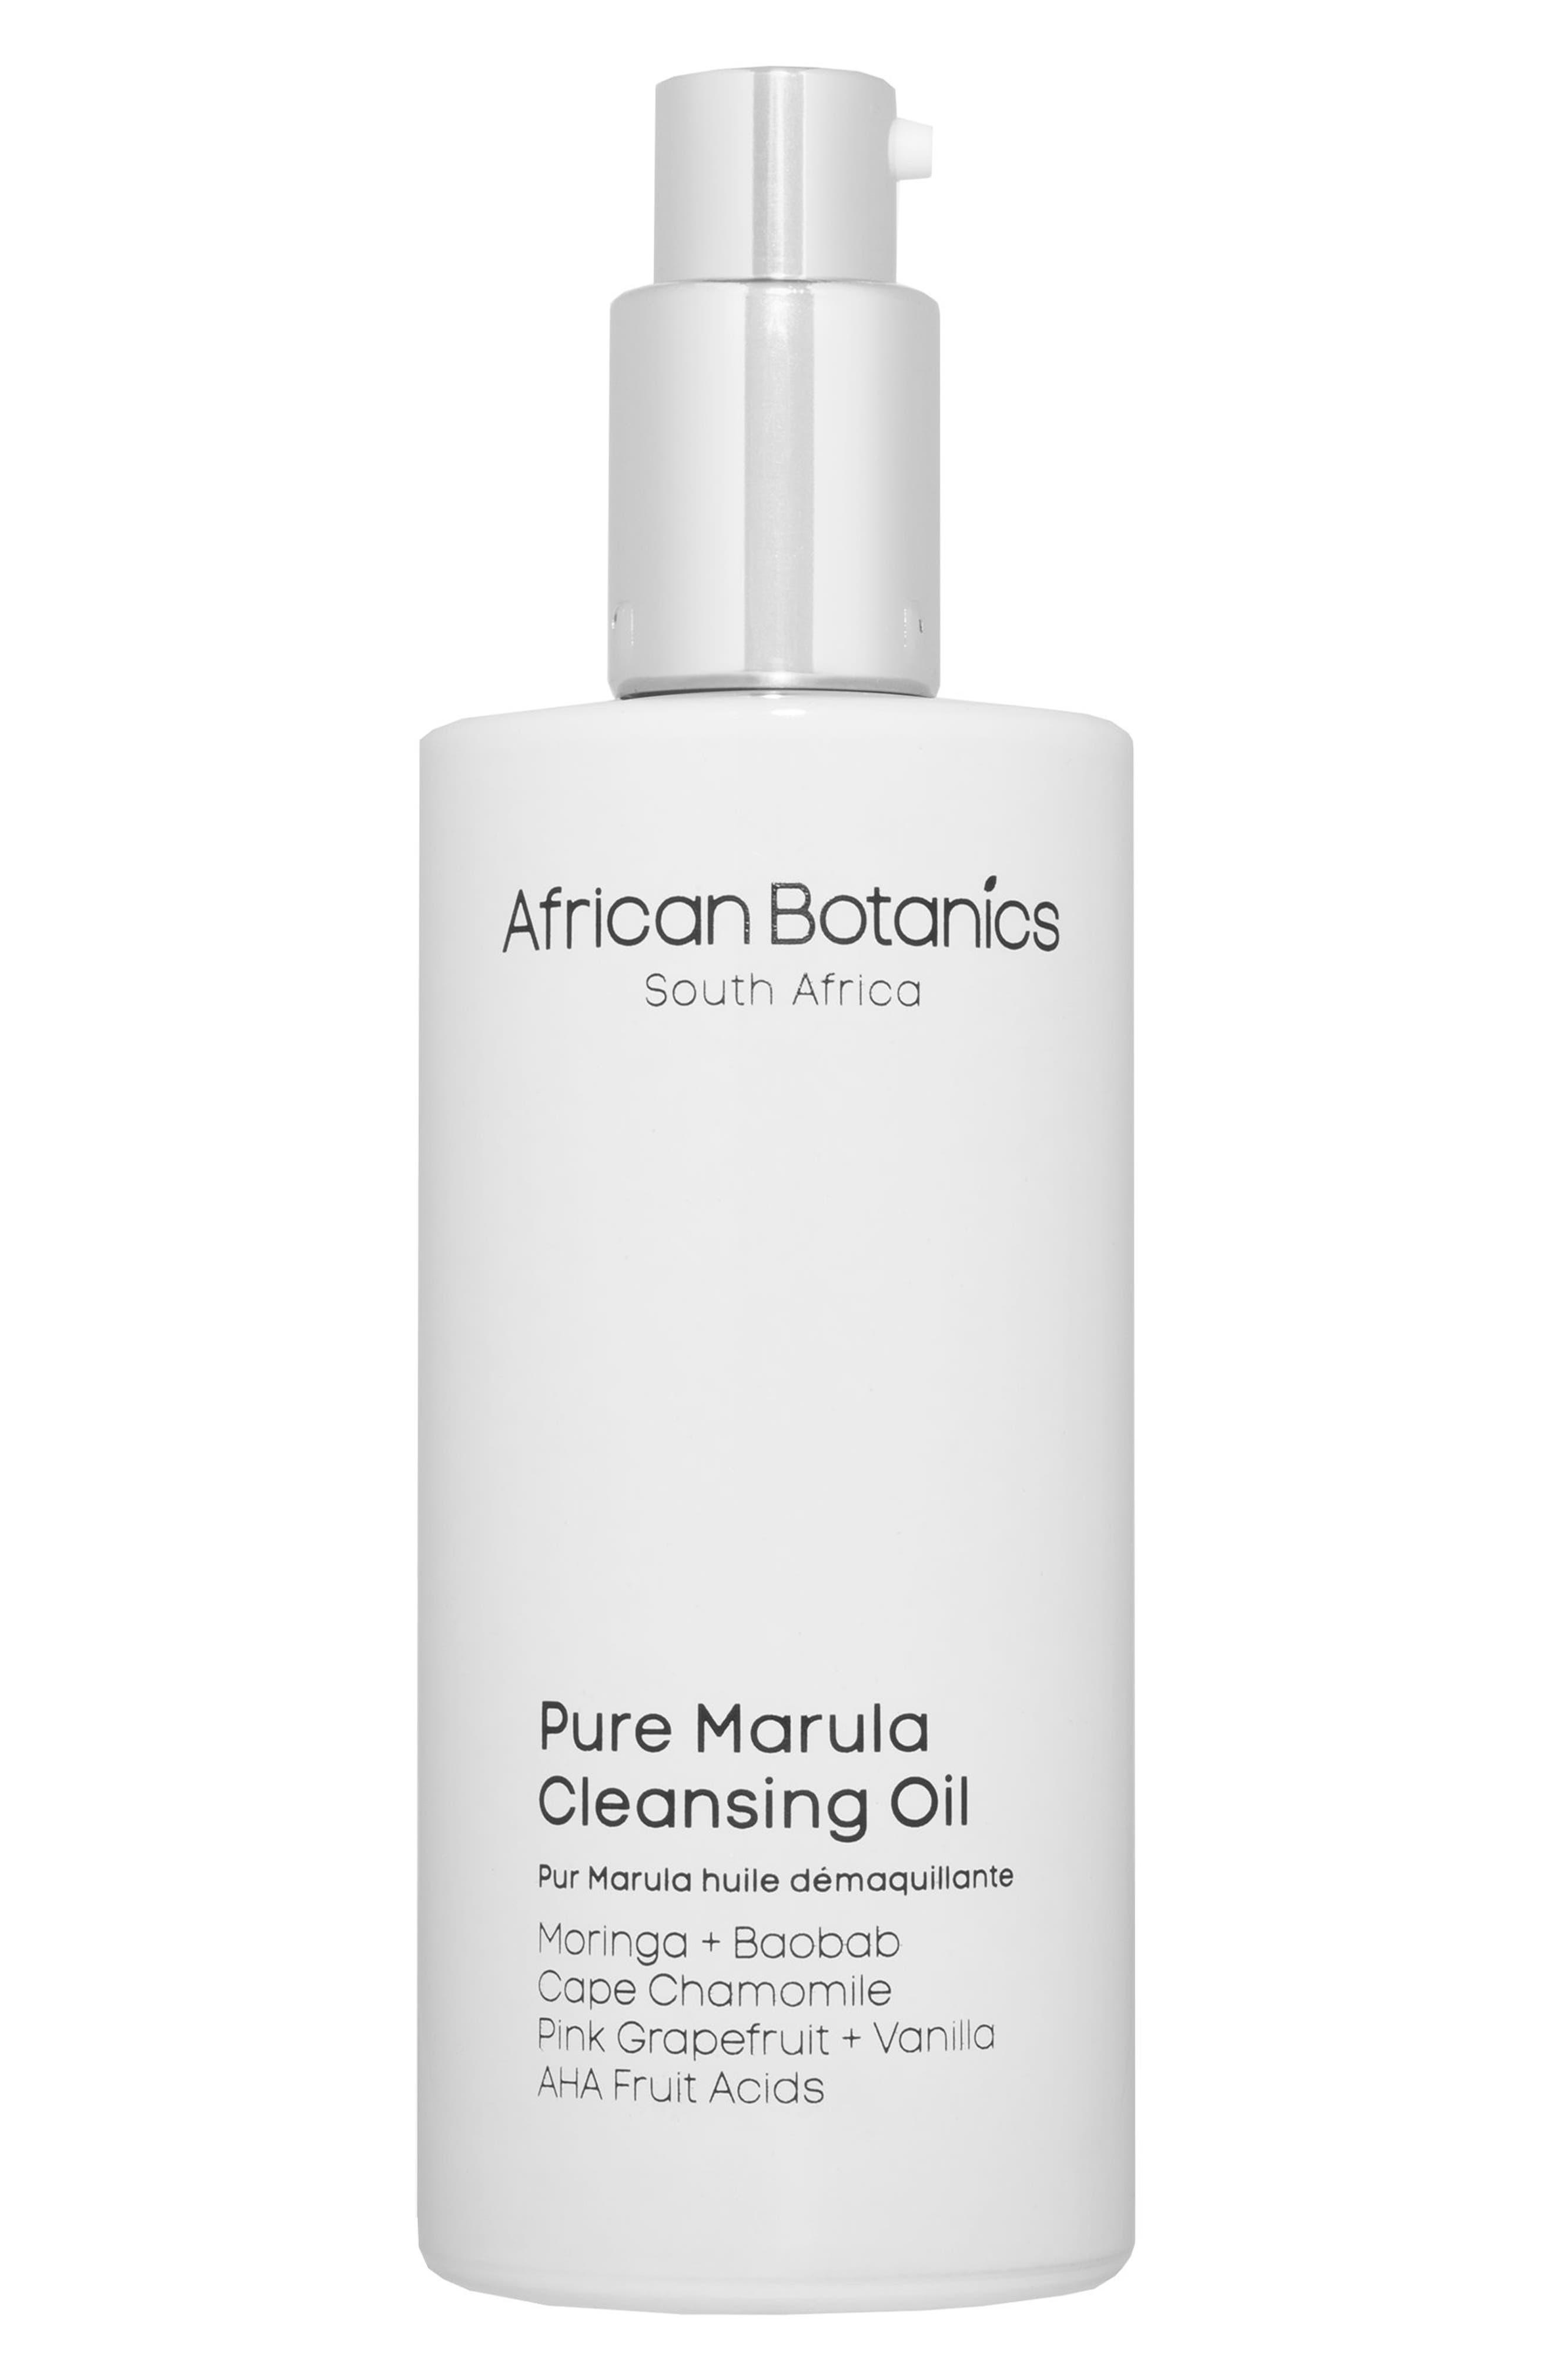 Alternate Image 1 Selected - African Botanics Pure Marula Cleansing Oil